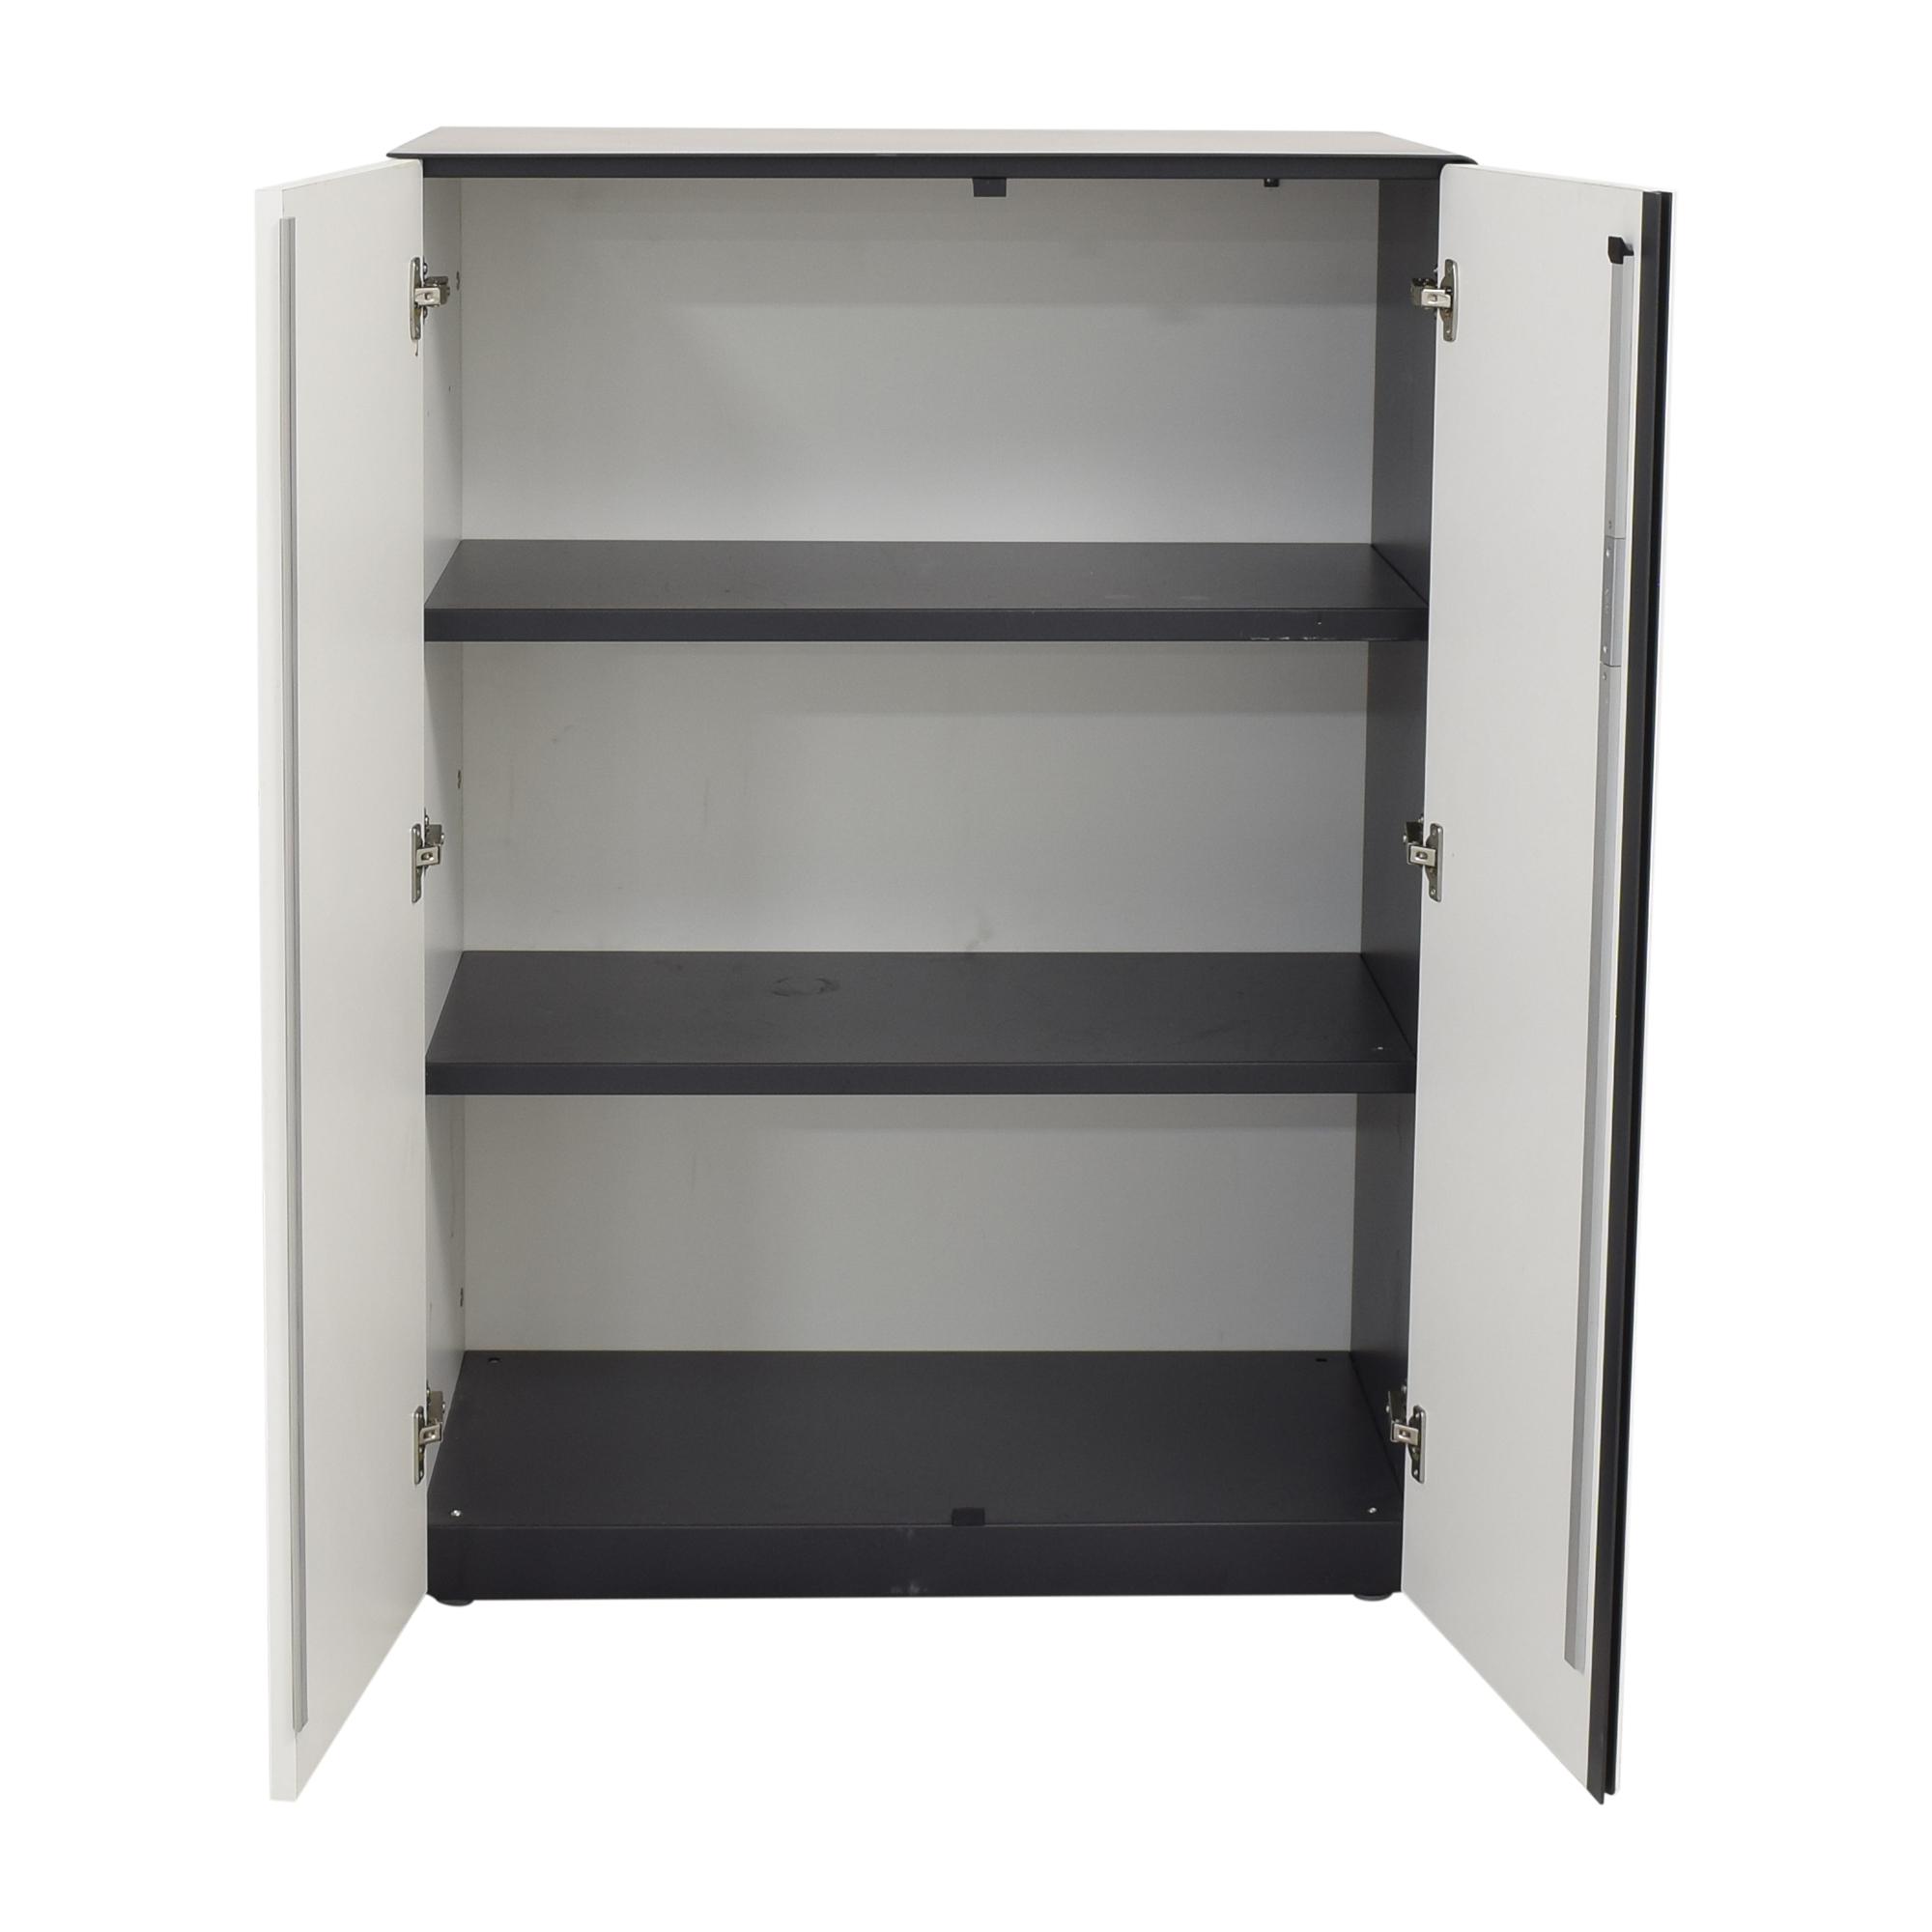 Koleksiyon Koleksiyon Song S2 Storage Cabinet second hand